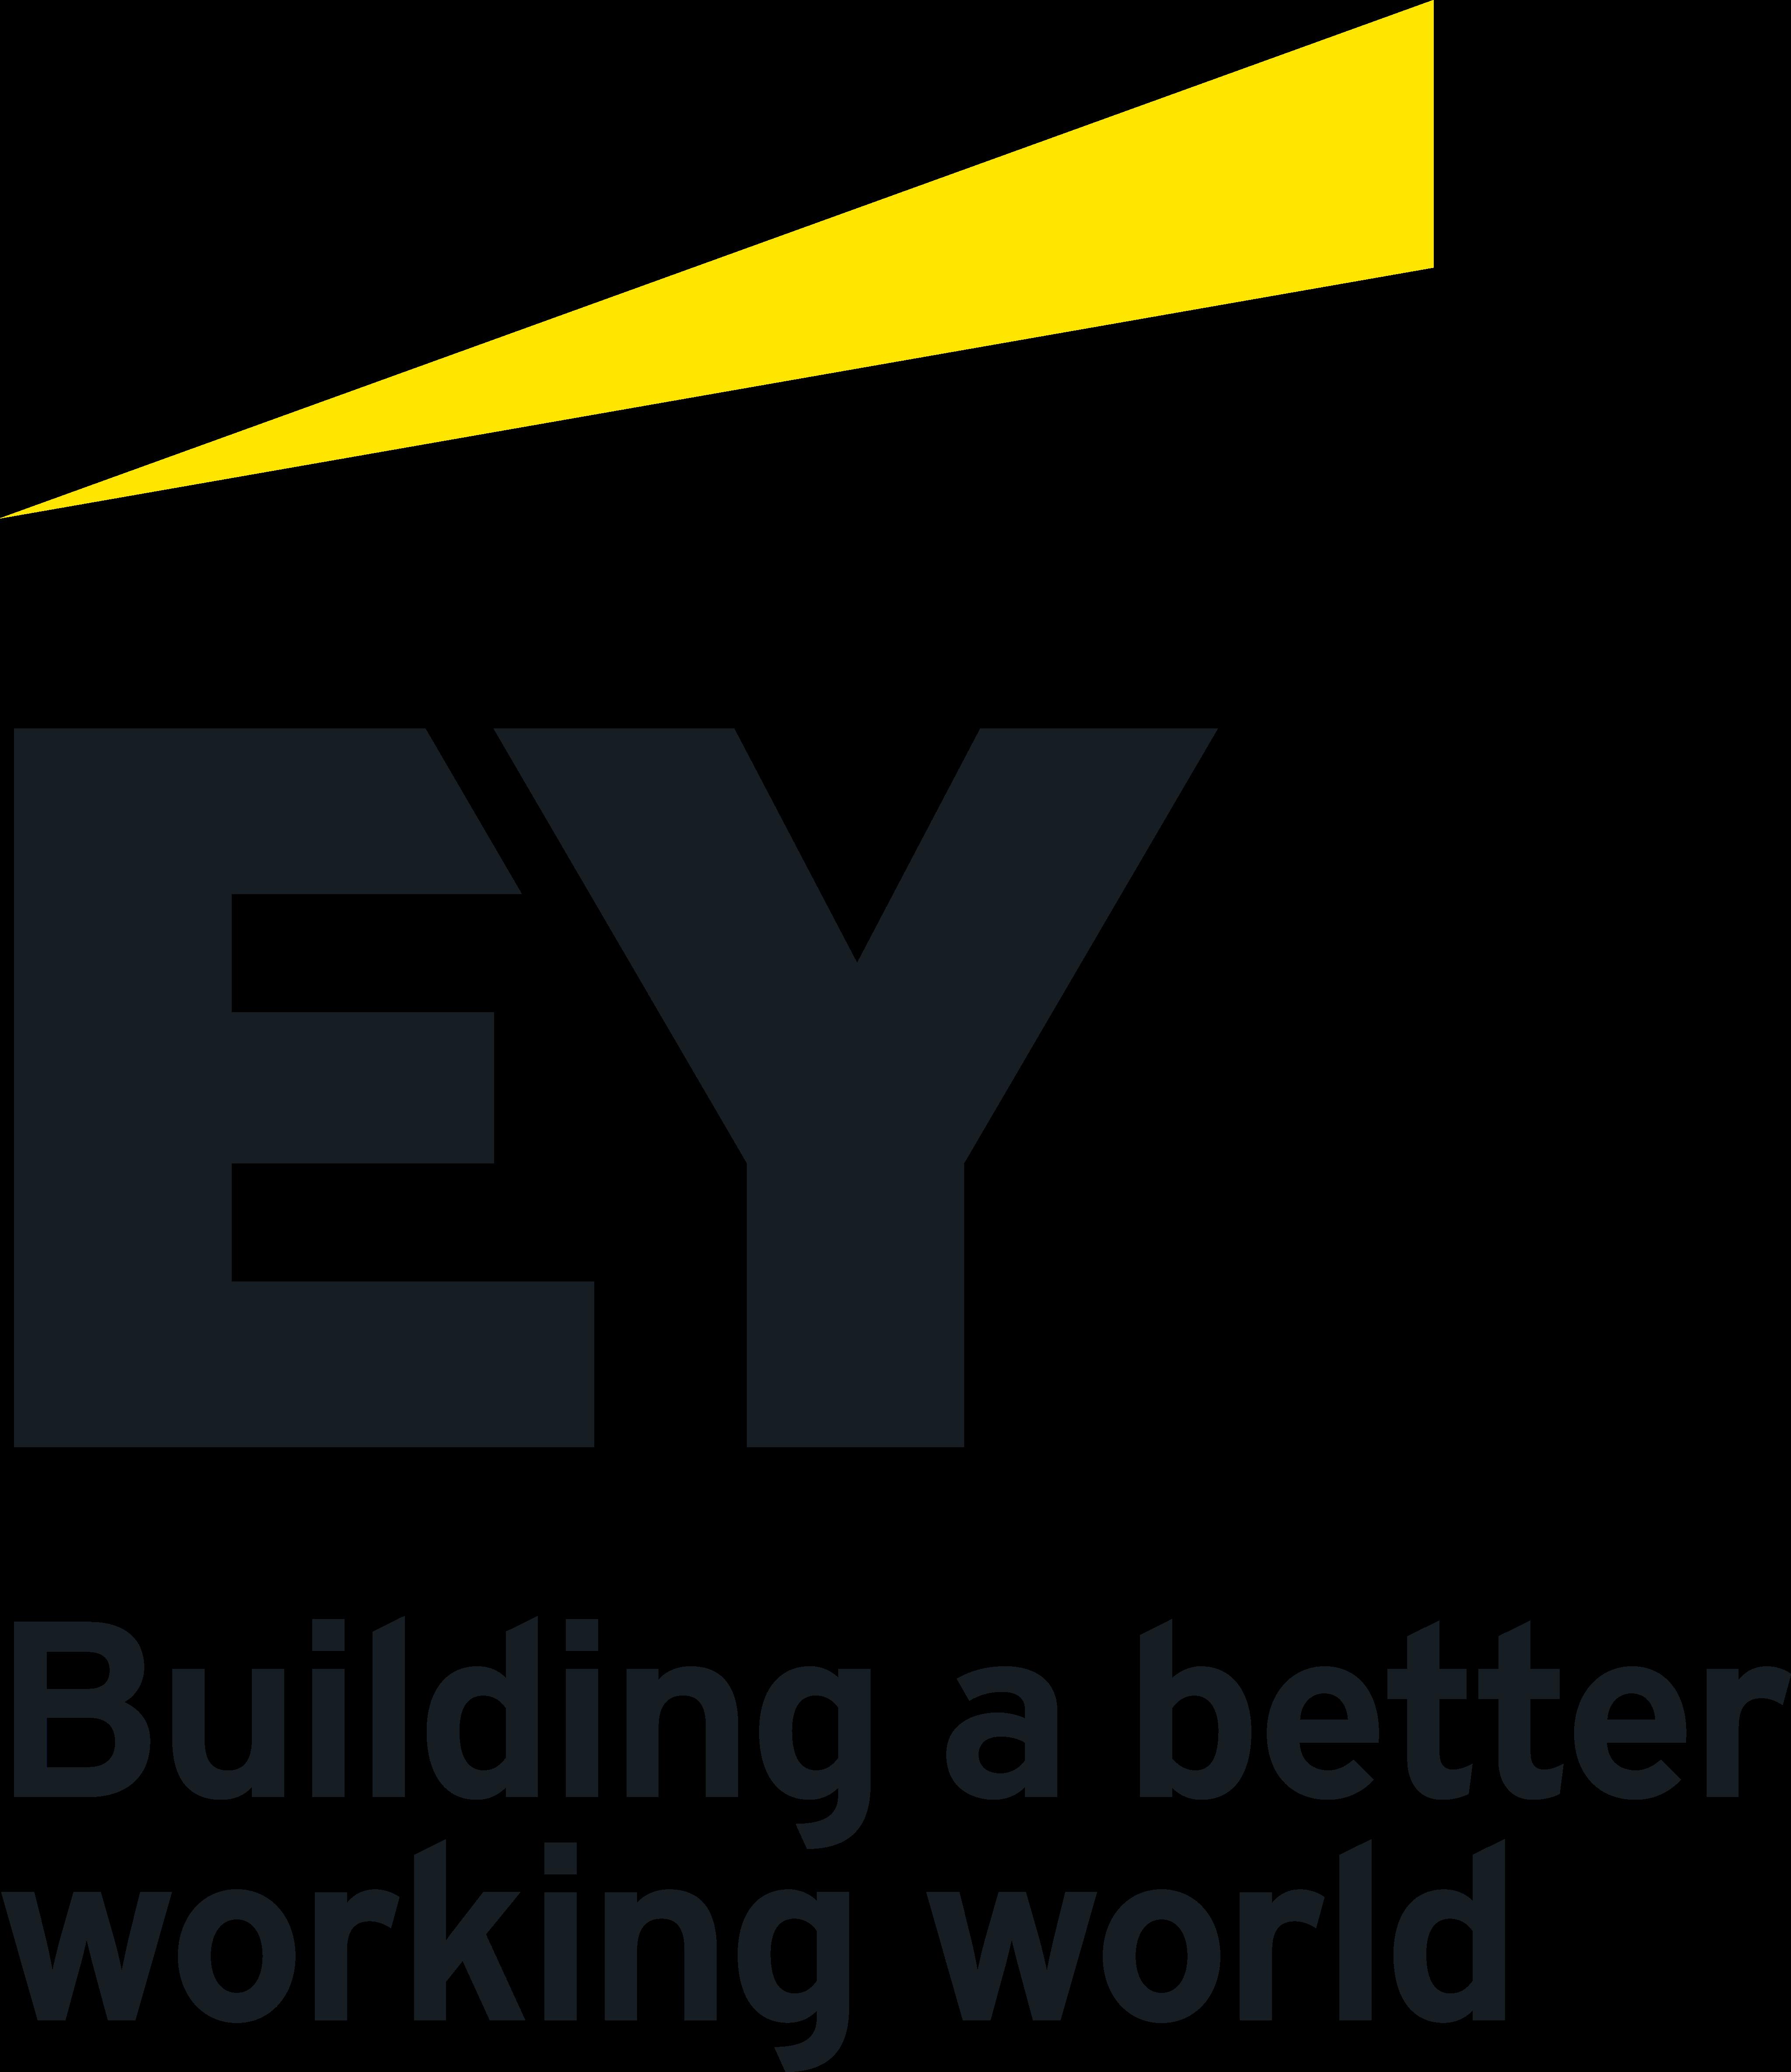 ernst young logo 1 - Ernst & Young Logo